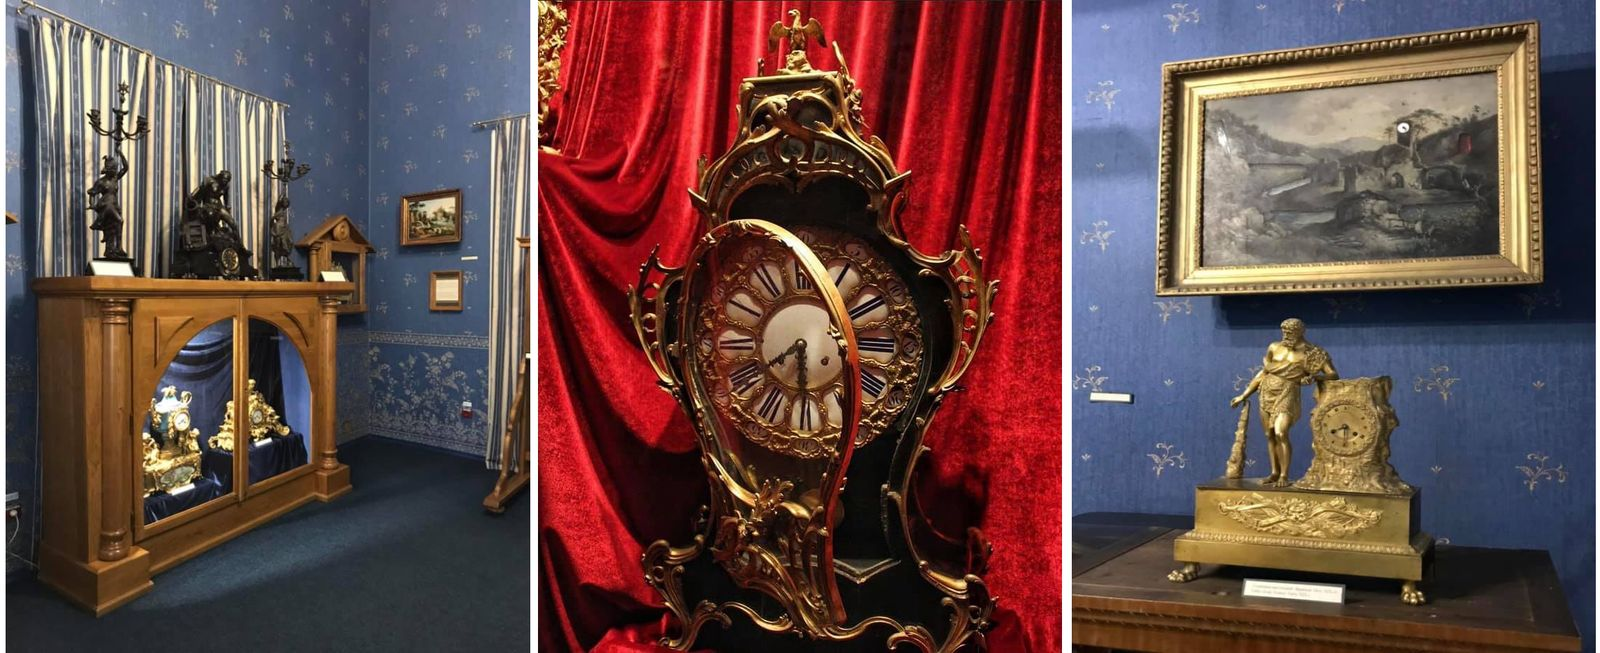 #СТОМУЗЕЇВ : огляд Музею етнографії та художнього промислу